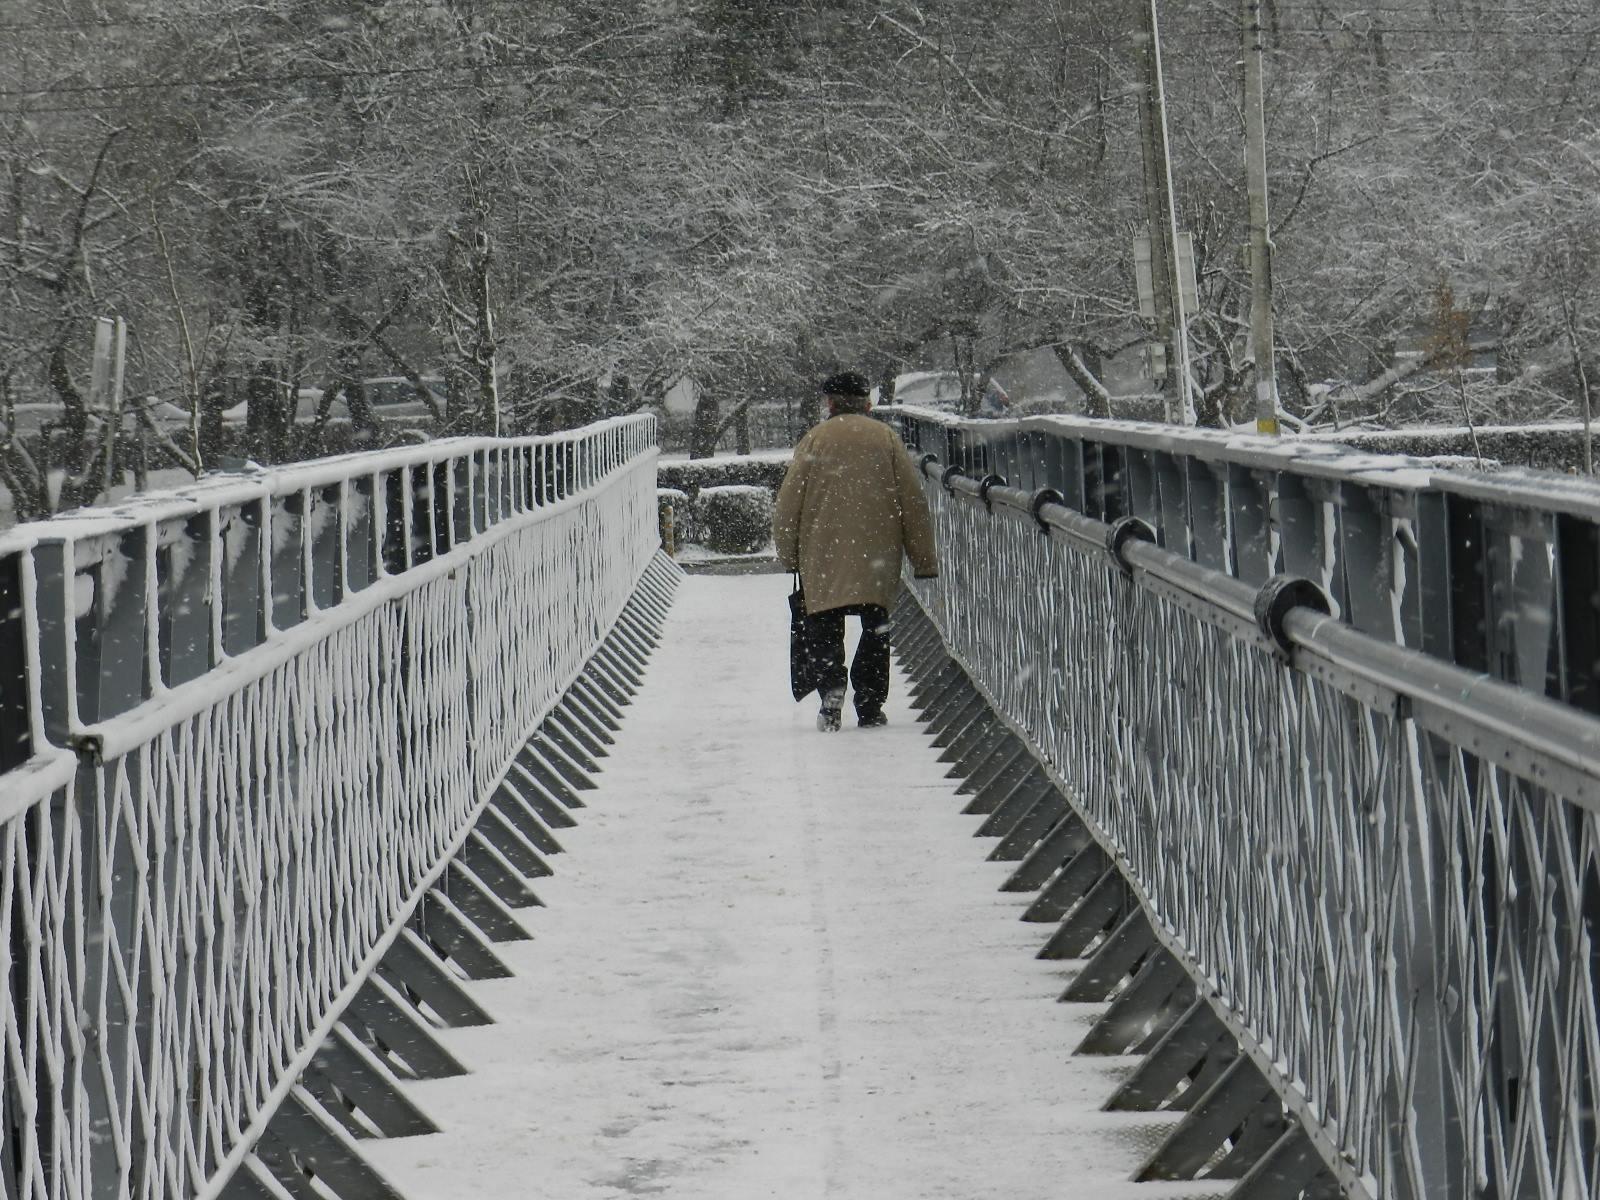 ninsoare cluj 2014